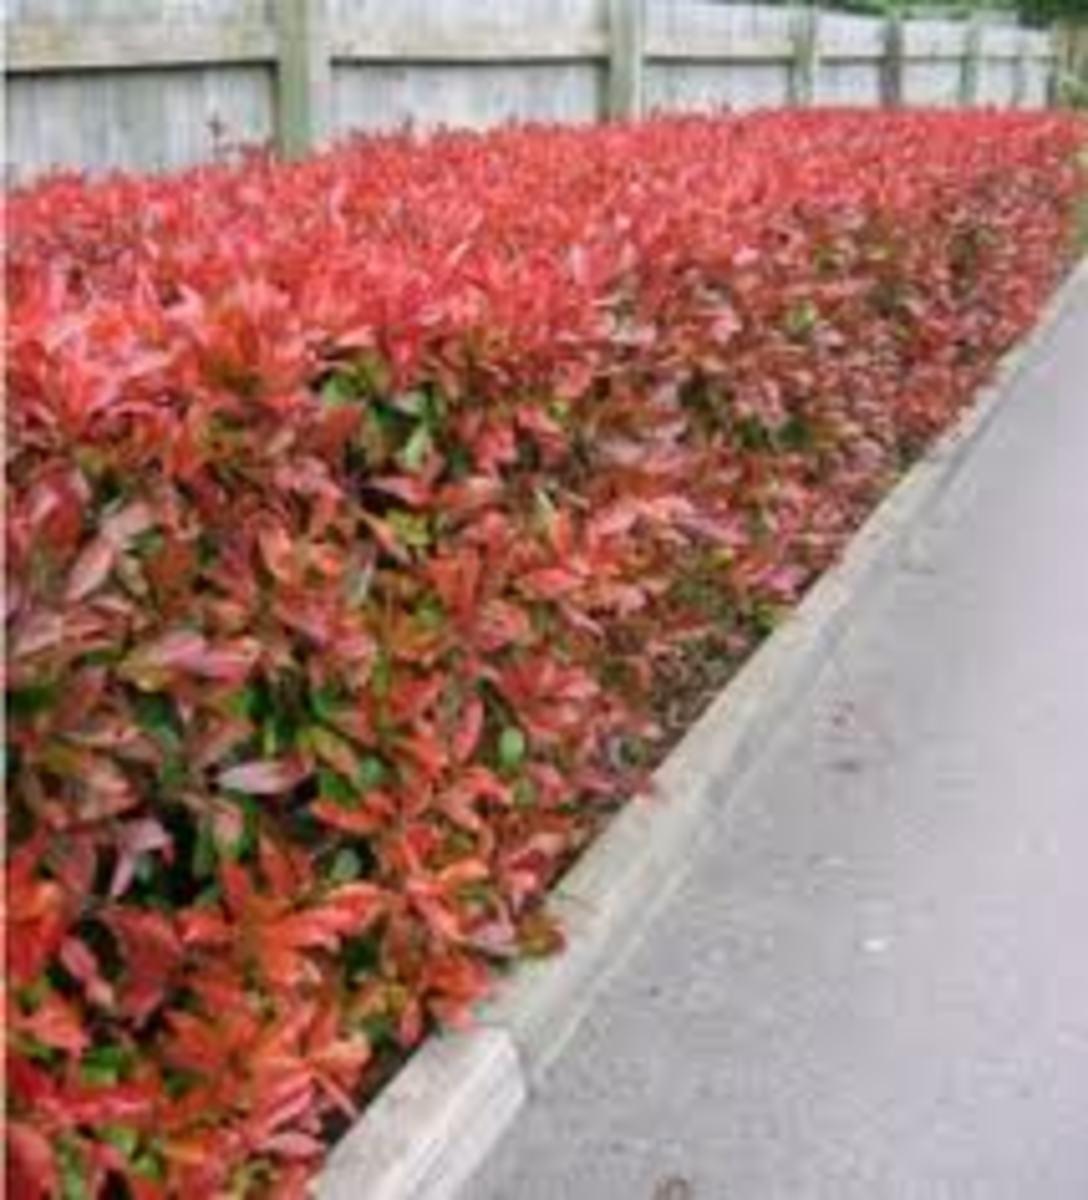 Colourful Hedge Plants